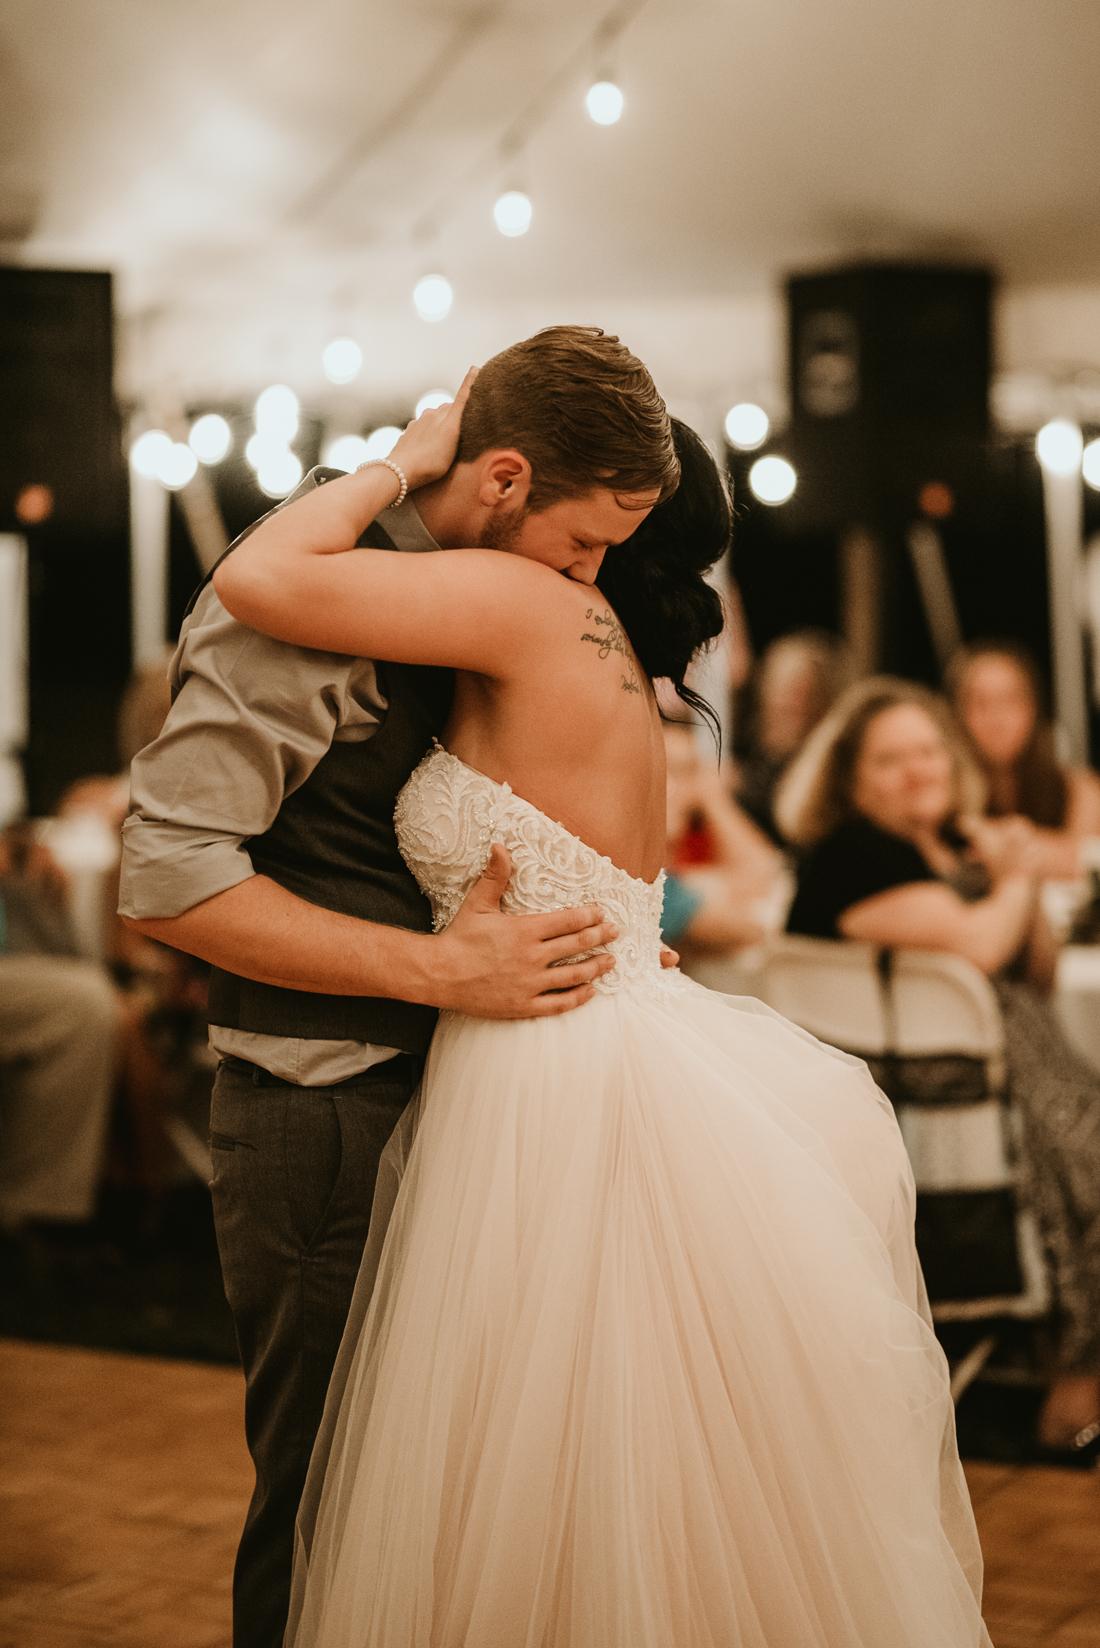 olivia_zay_wedding_09_2018-7866.jpg